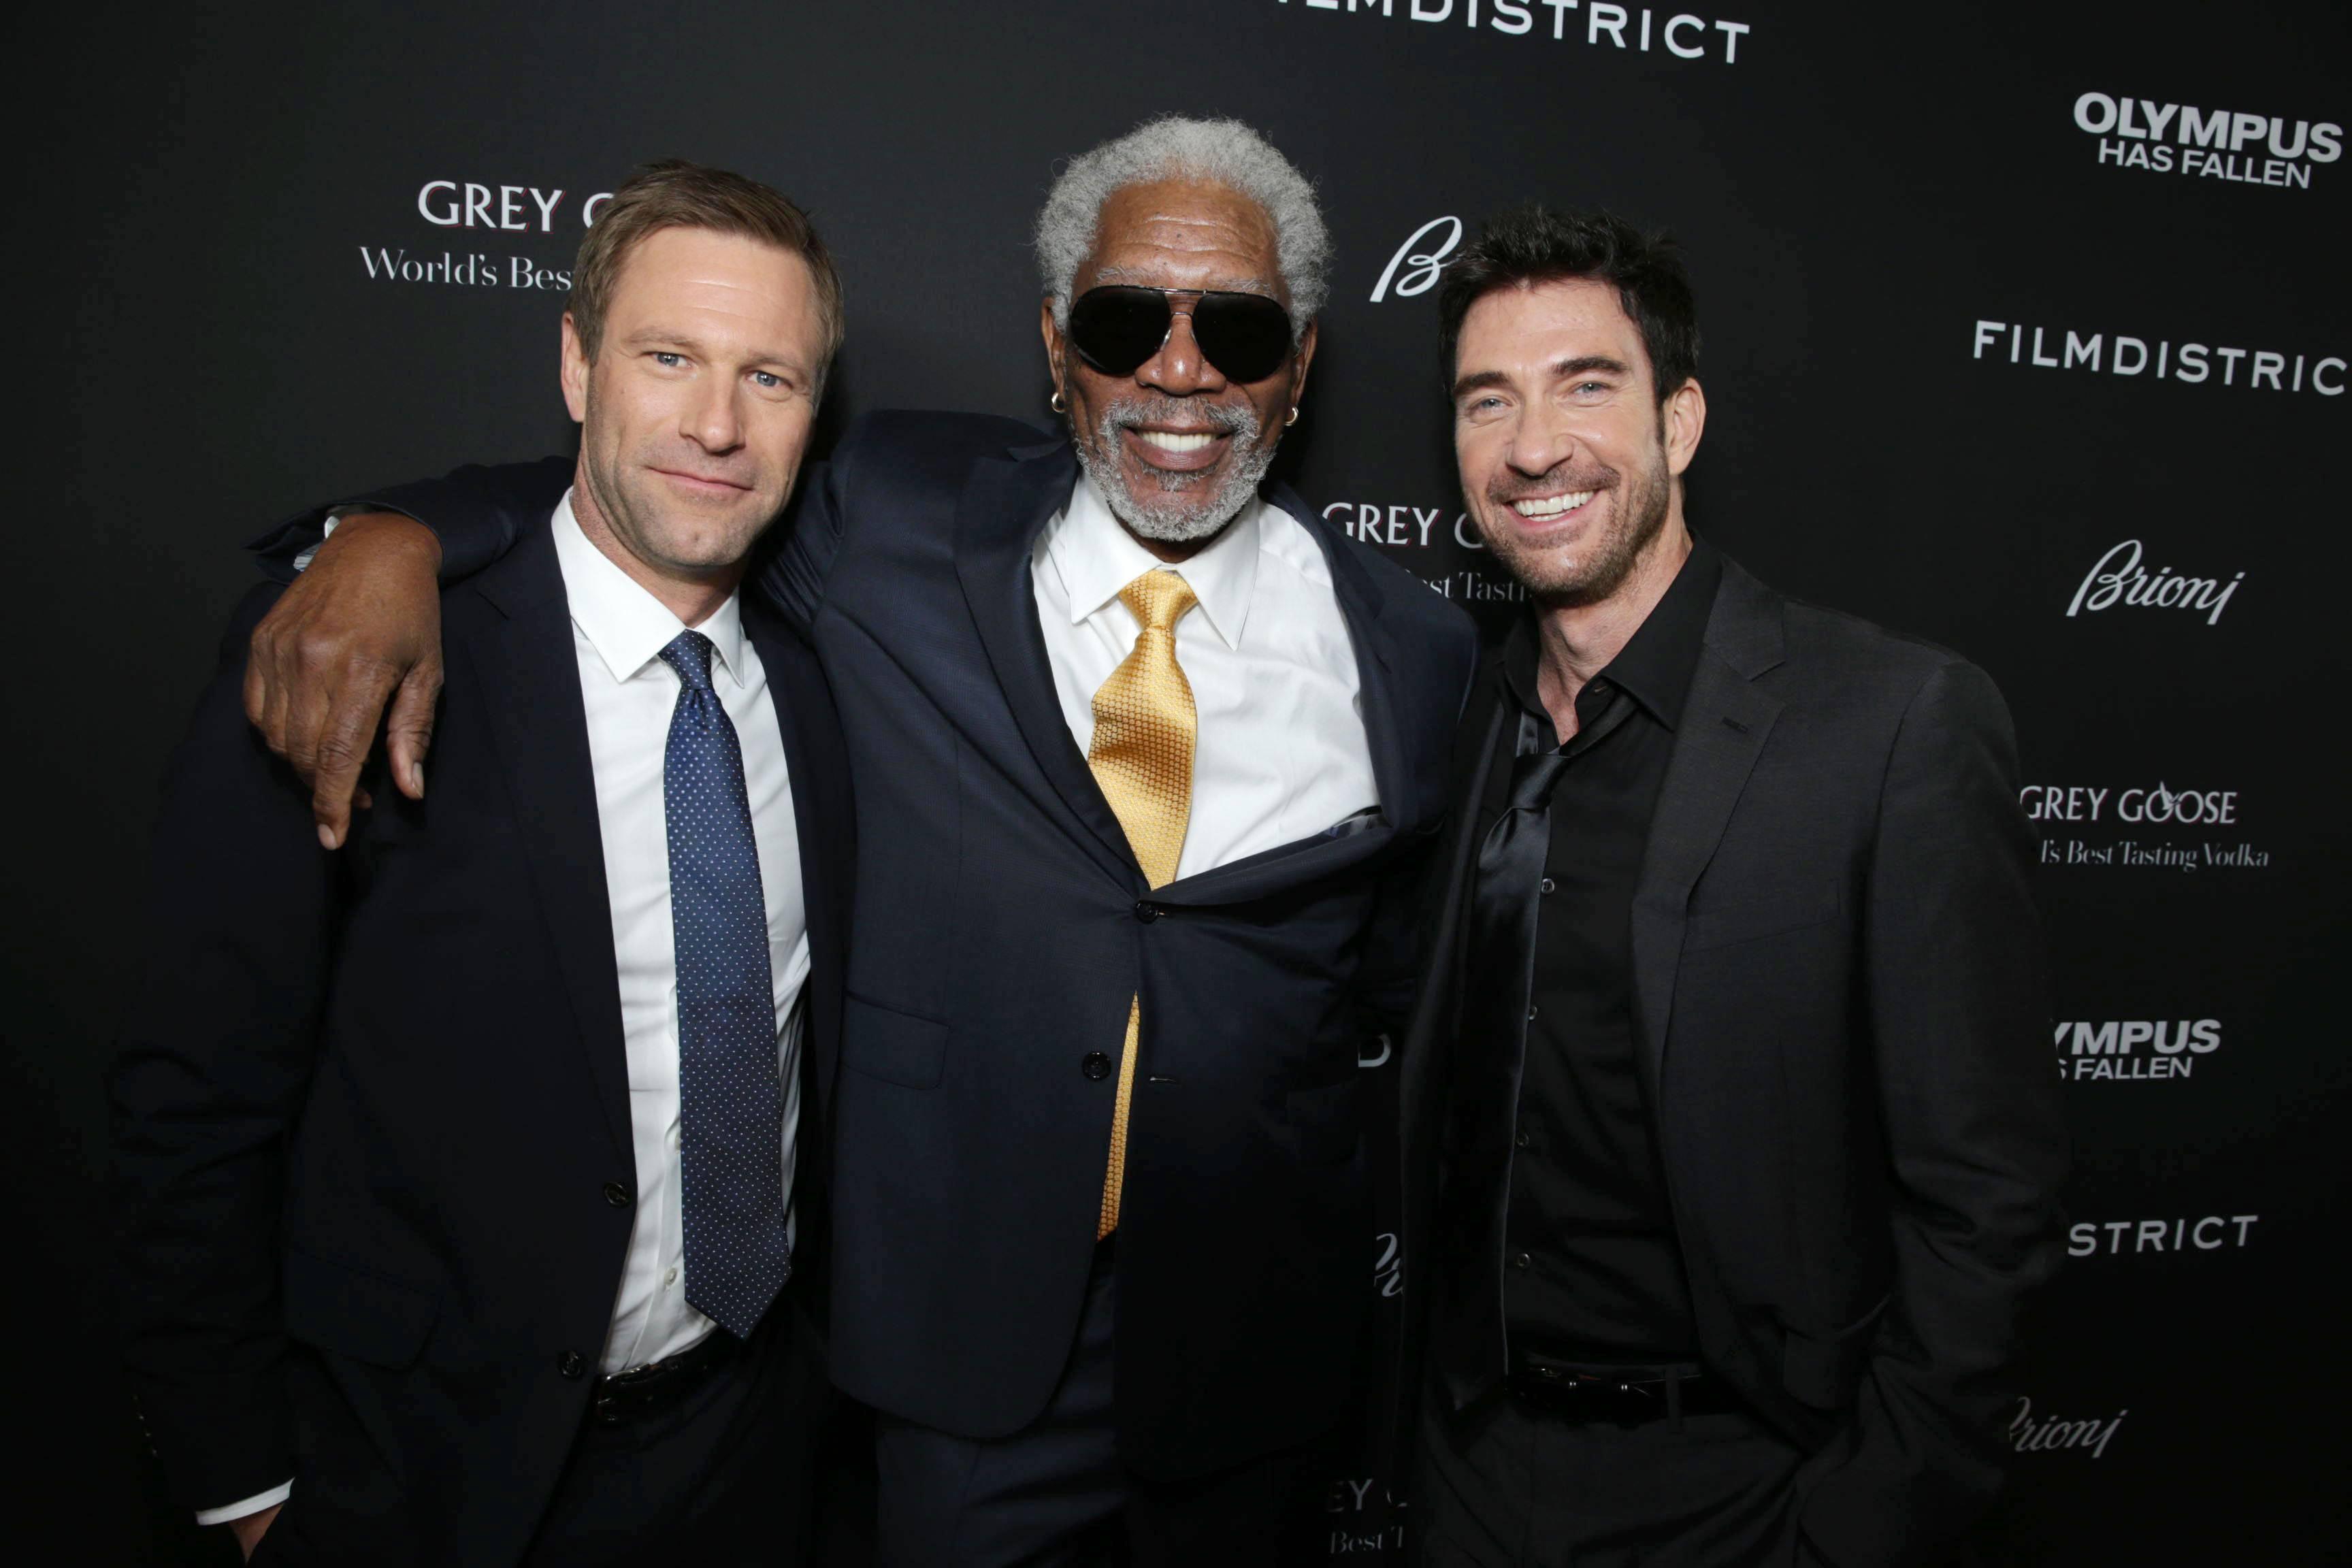 Aaron Eckhart, Morgan Freeman, Dylan McDermott